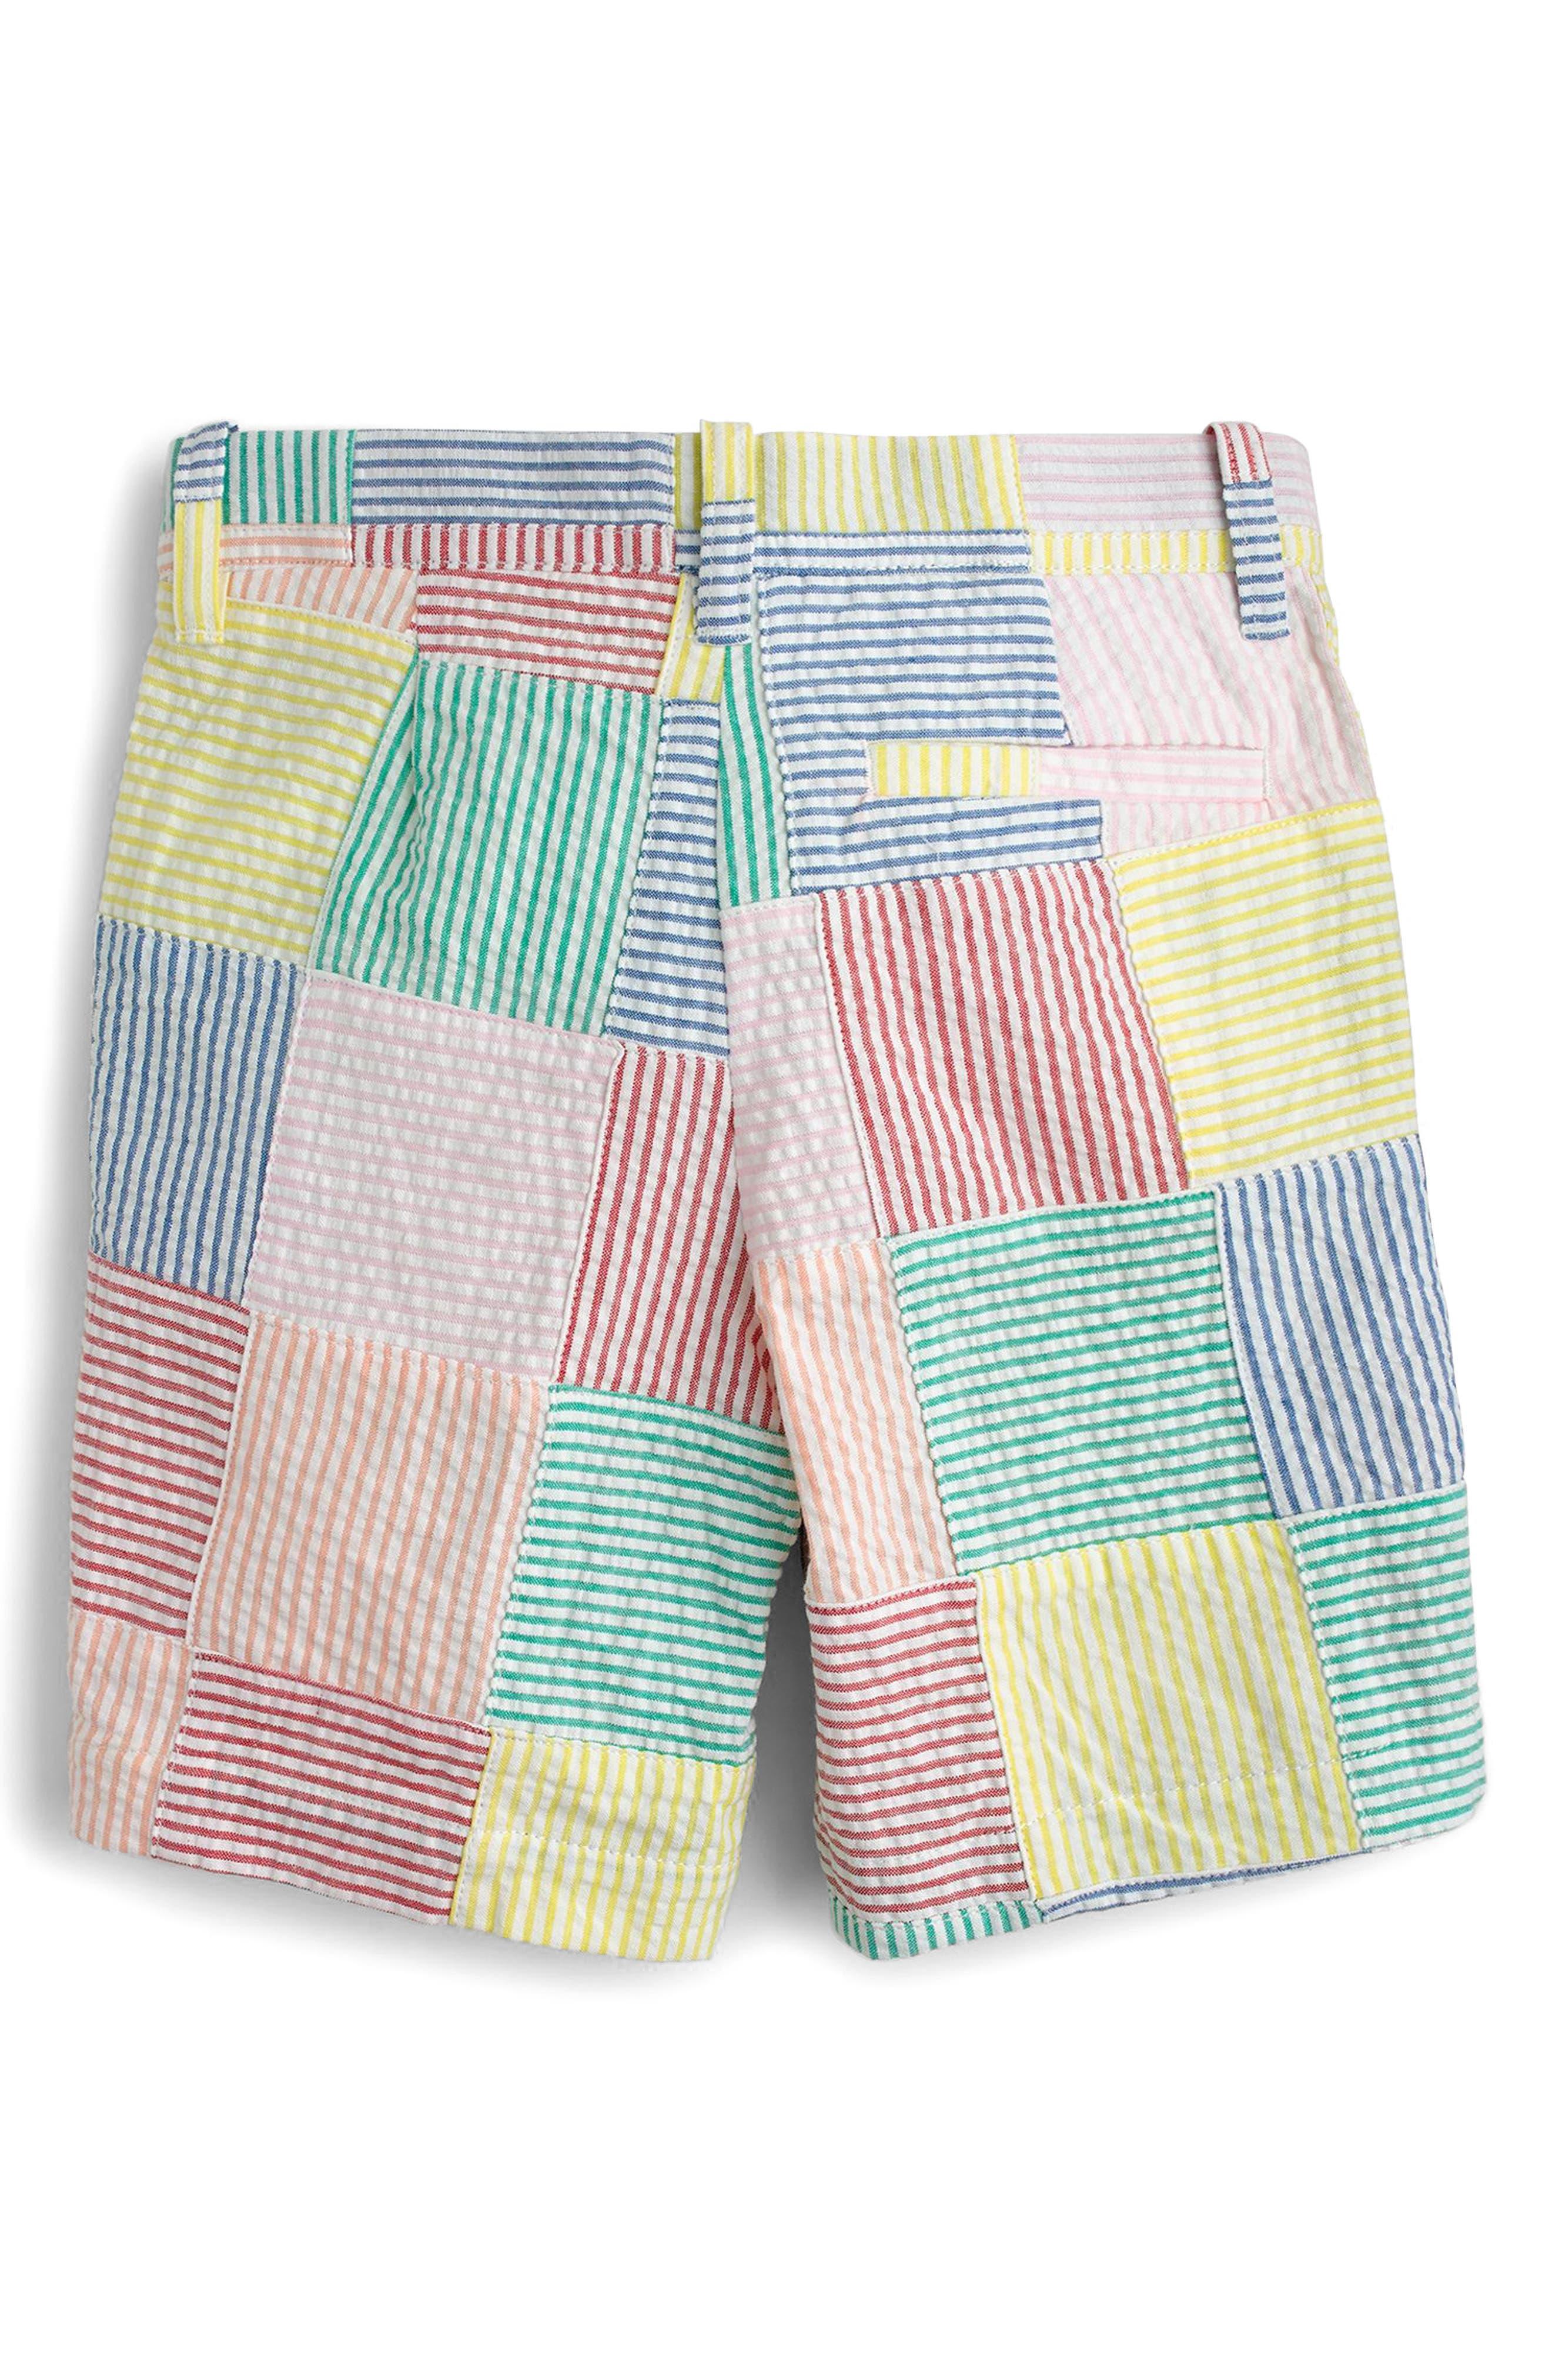 Crewcuts Stanton Patchwork Shorts,                             Alternate thumbnail 2, color,                             900